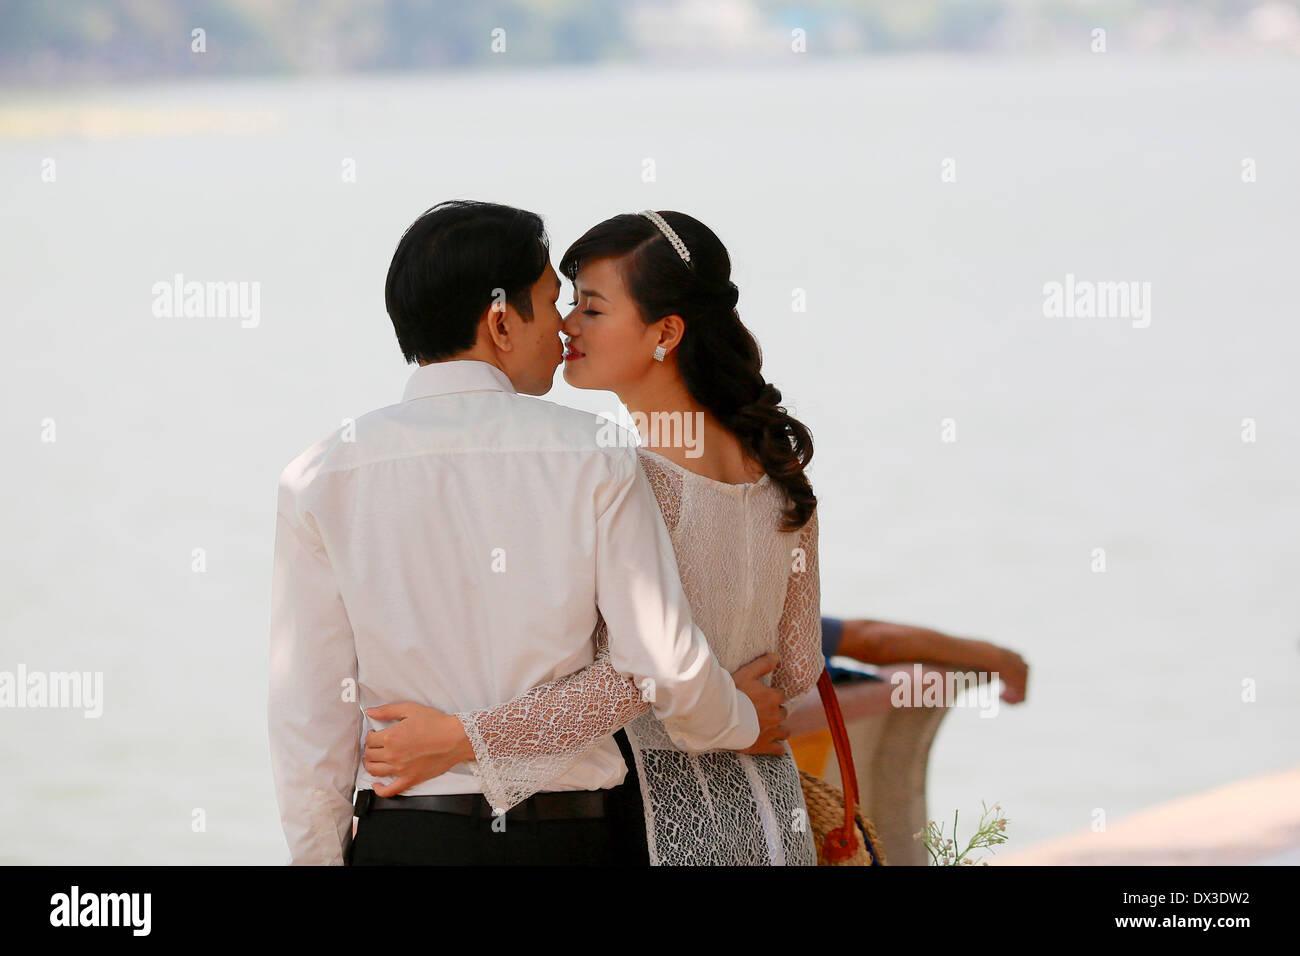 A Vietnamese couple having their engagement photographs taken by the Hoan Kiem Lake in Hanoi - Stock Image